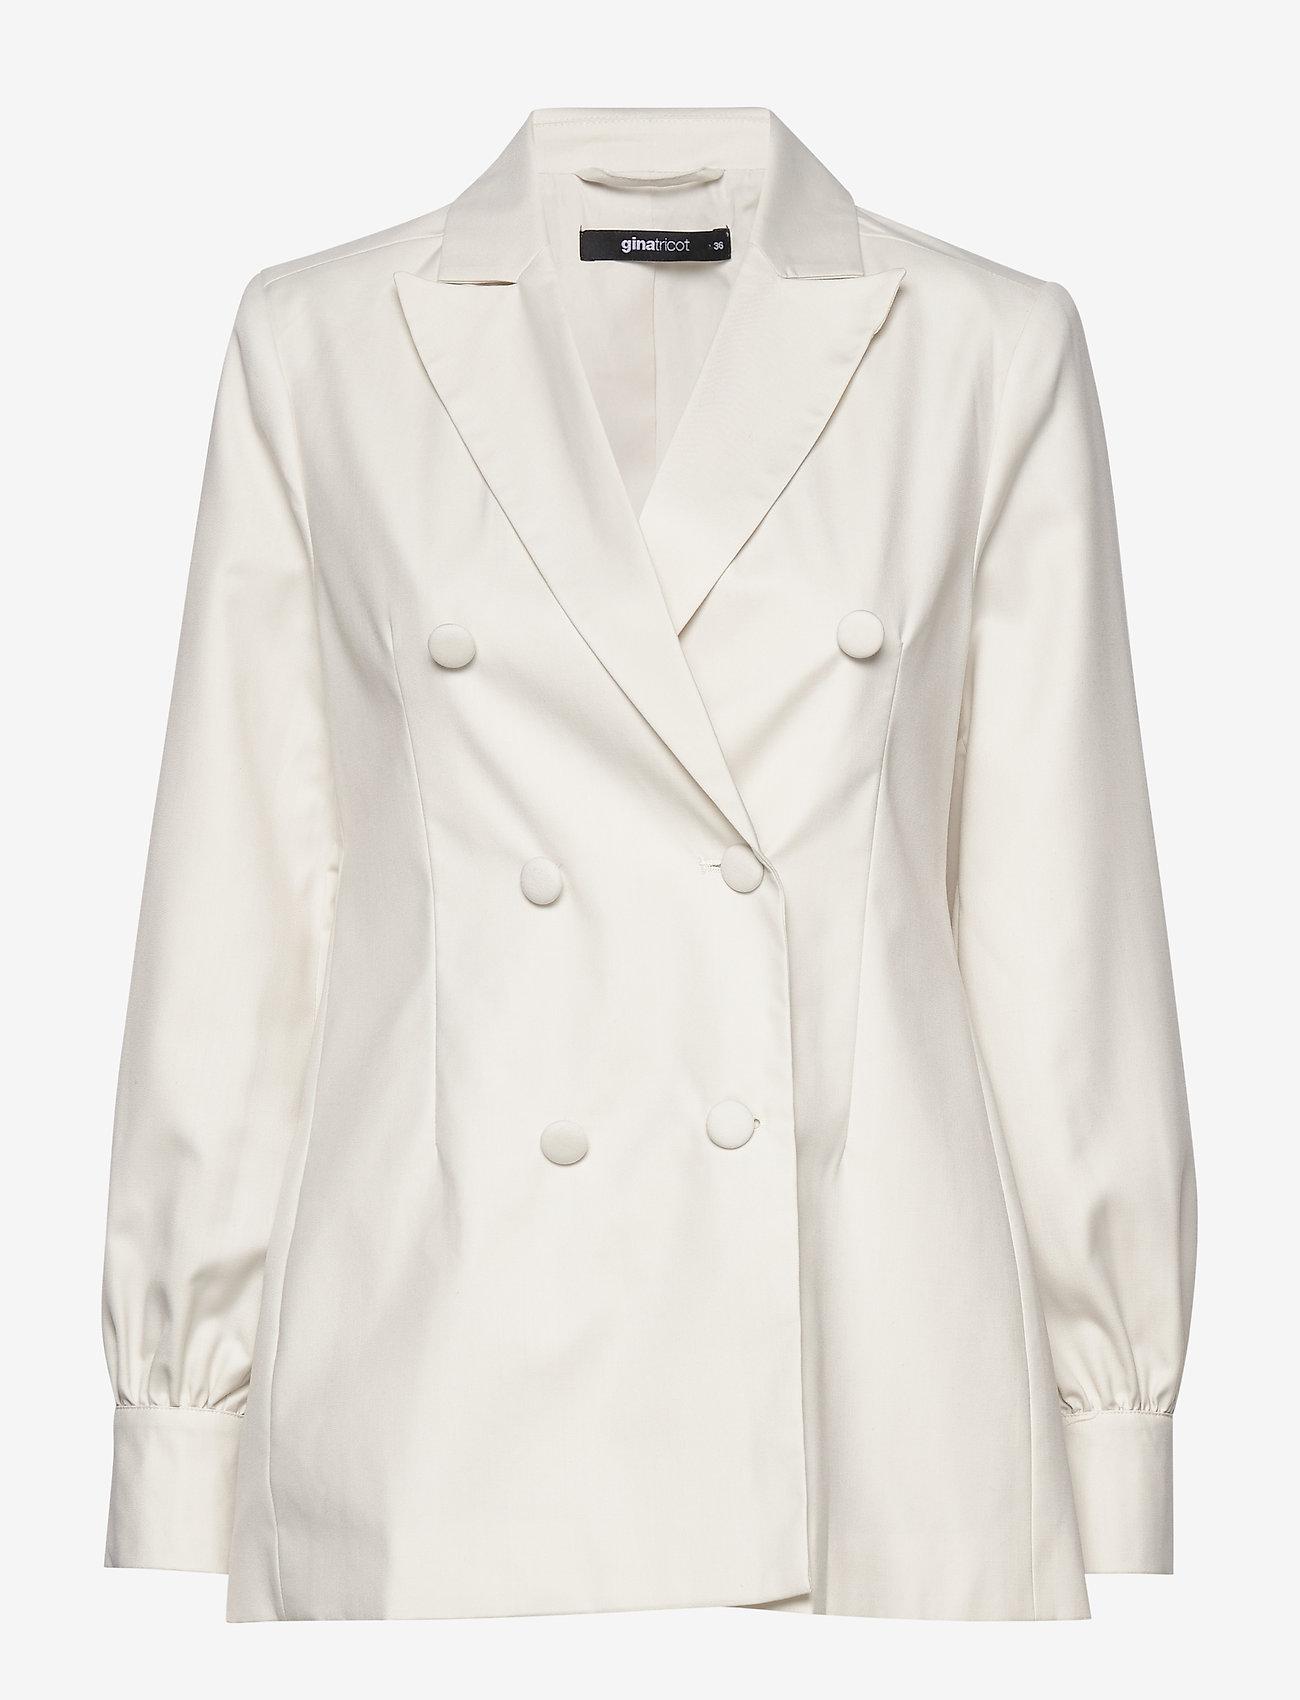 Gina Tricot - Sally blazer - bleiserit - white (1000)